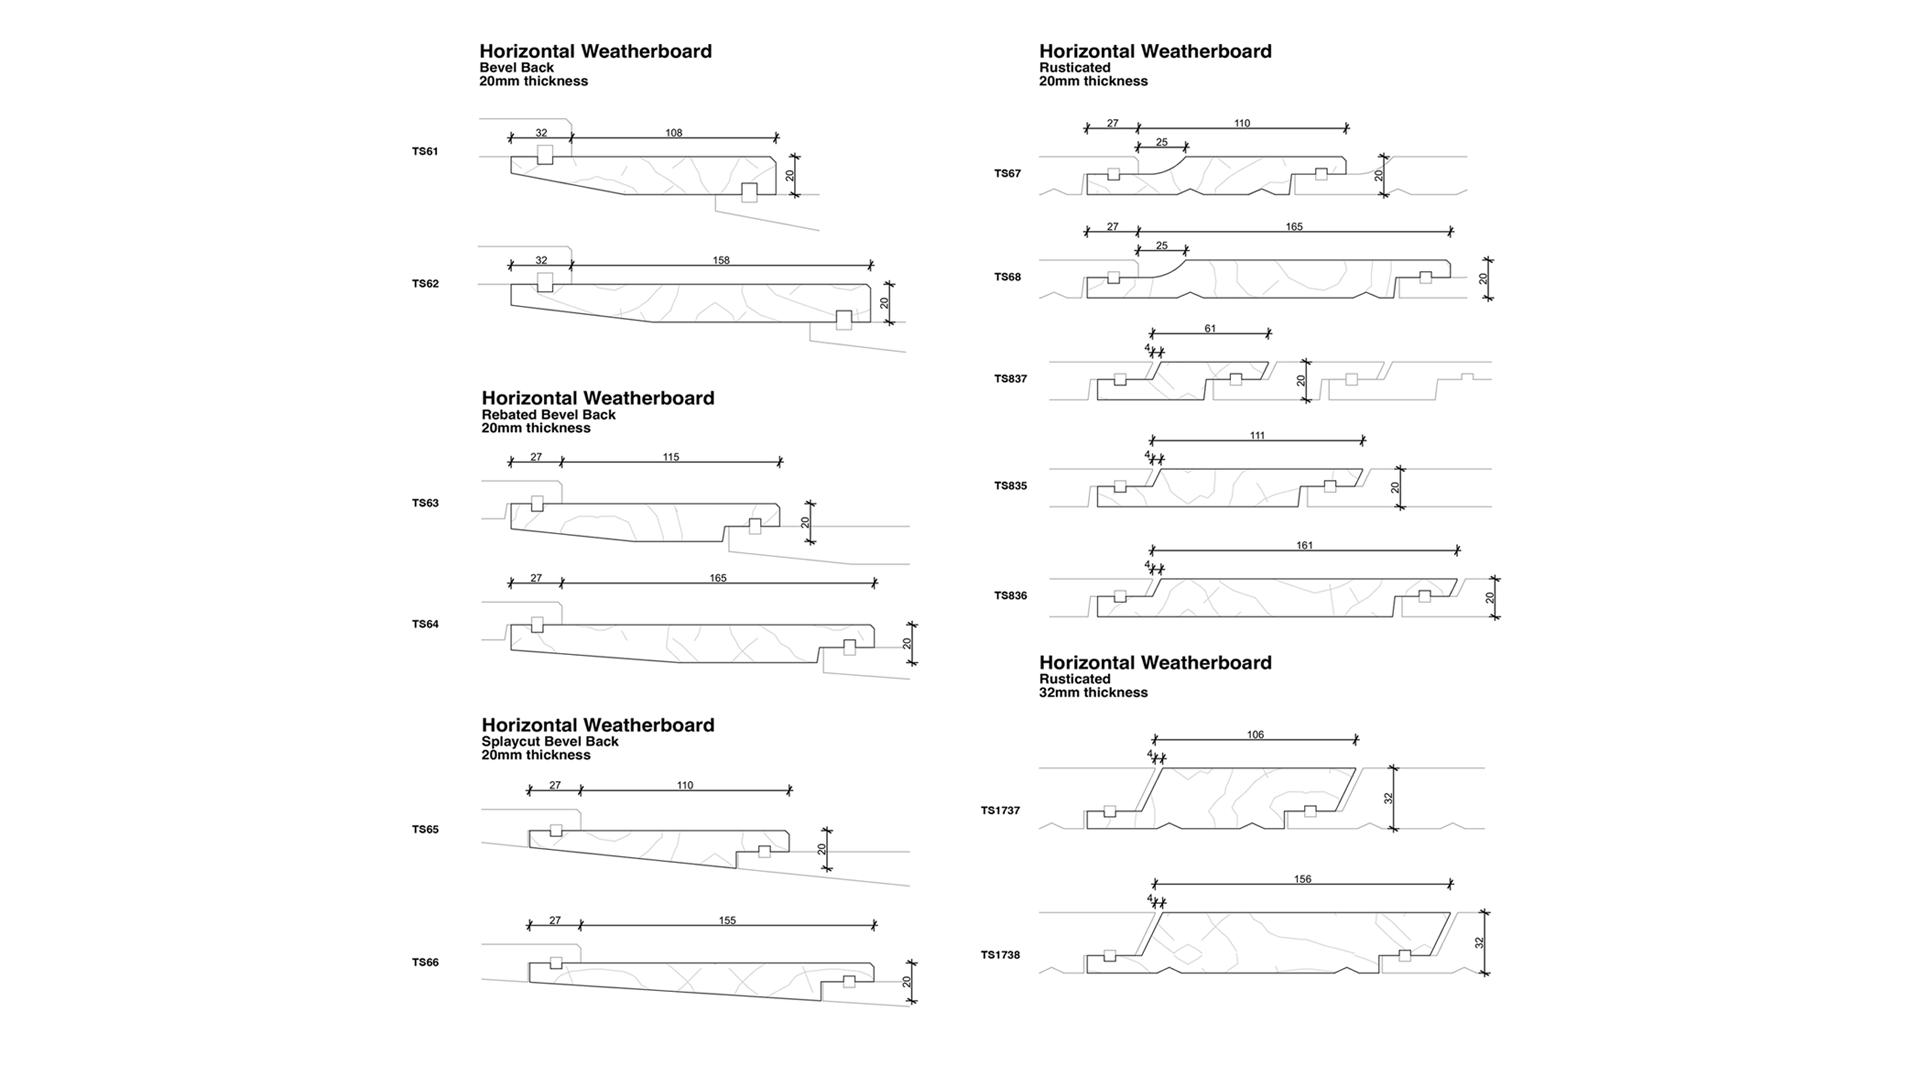 TS-Profiles horizontal weatherboard